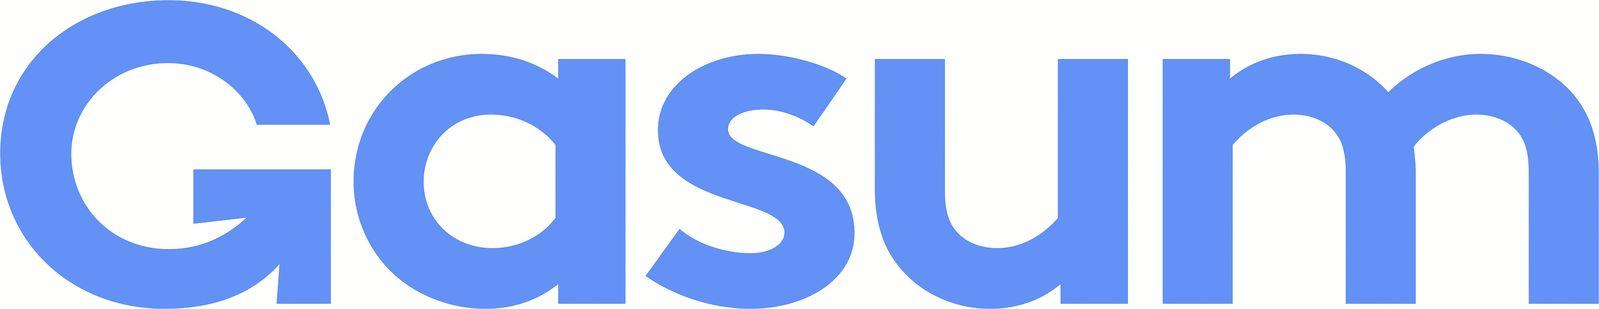 Logo: Puhdas kaasu